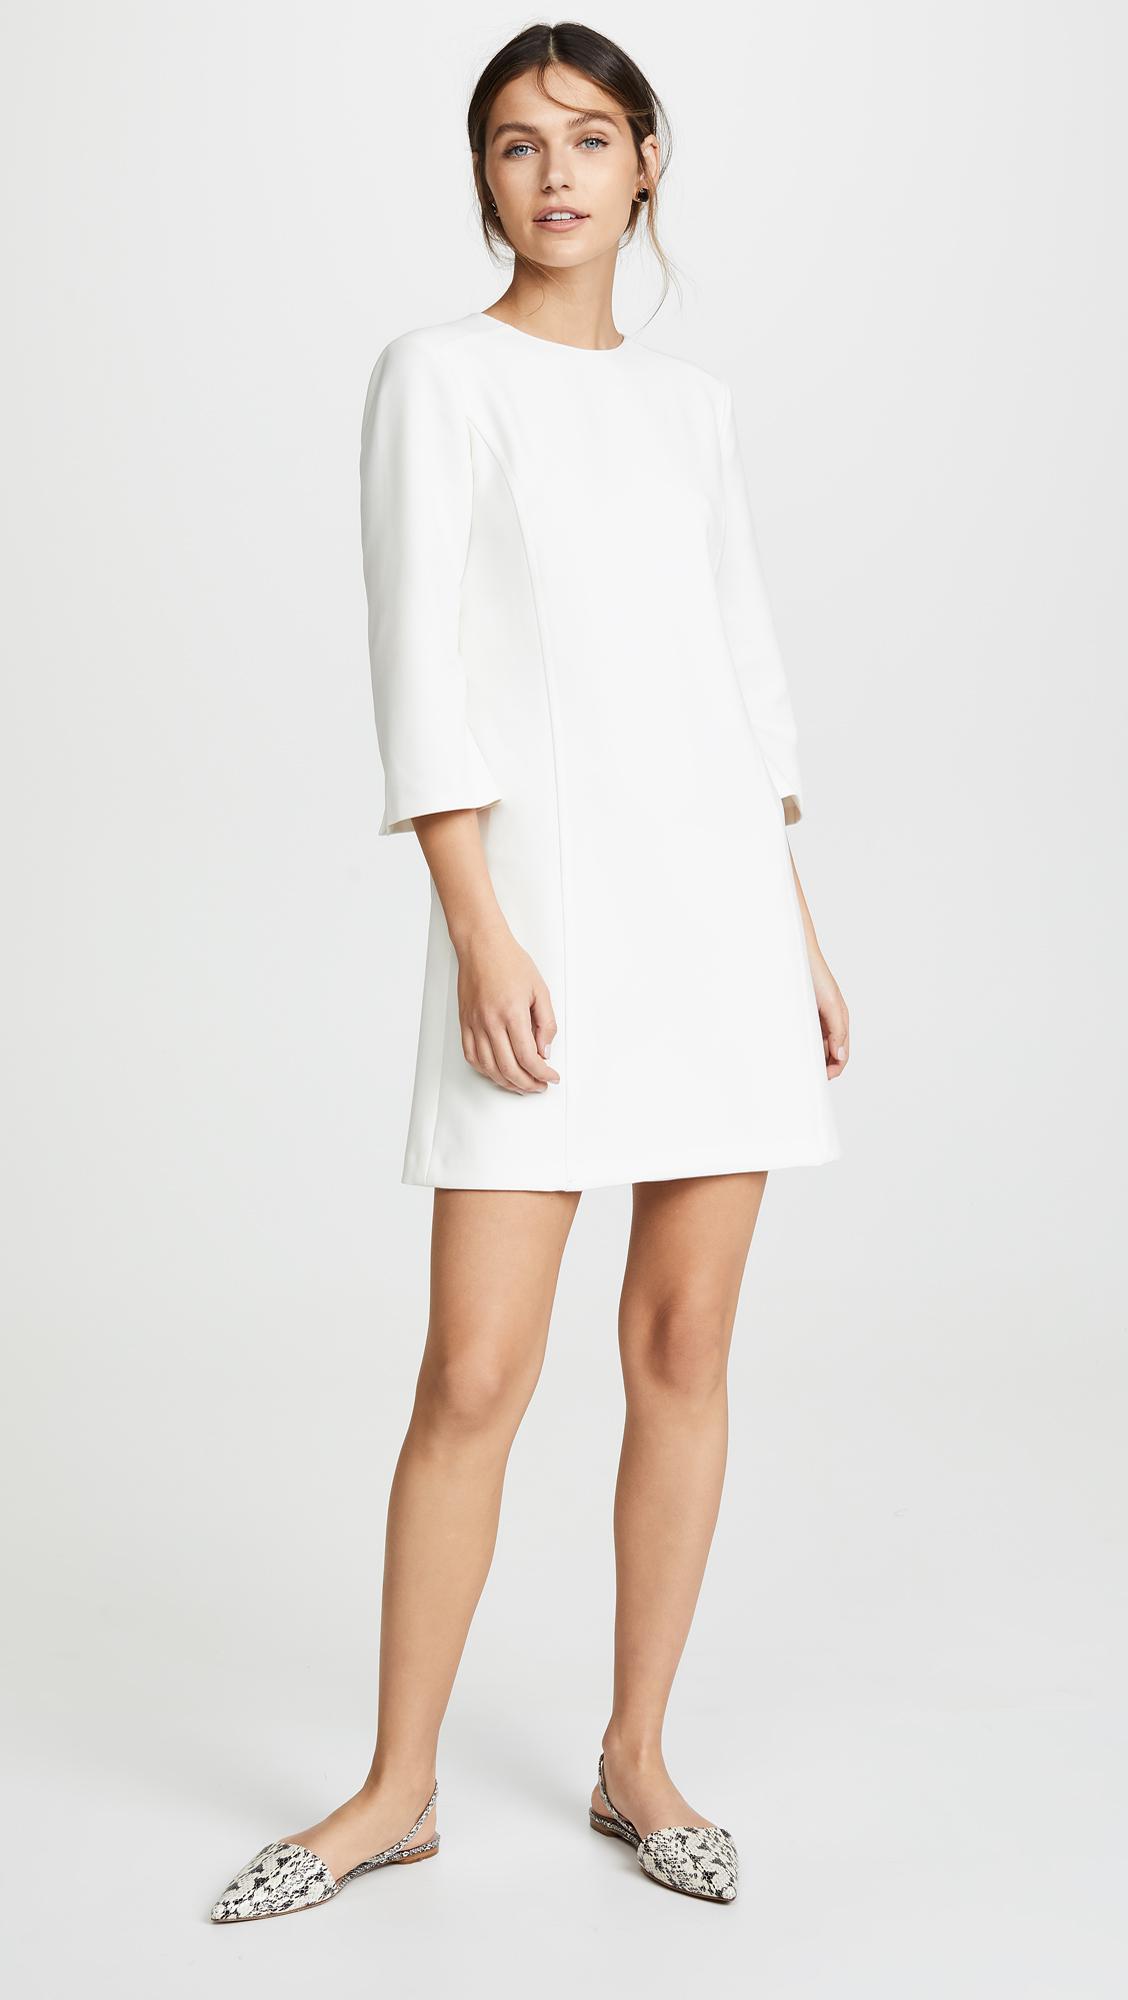 7f77e8b968c alice + olivia Gem 3 4 Sleeve Shift Dress